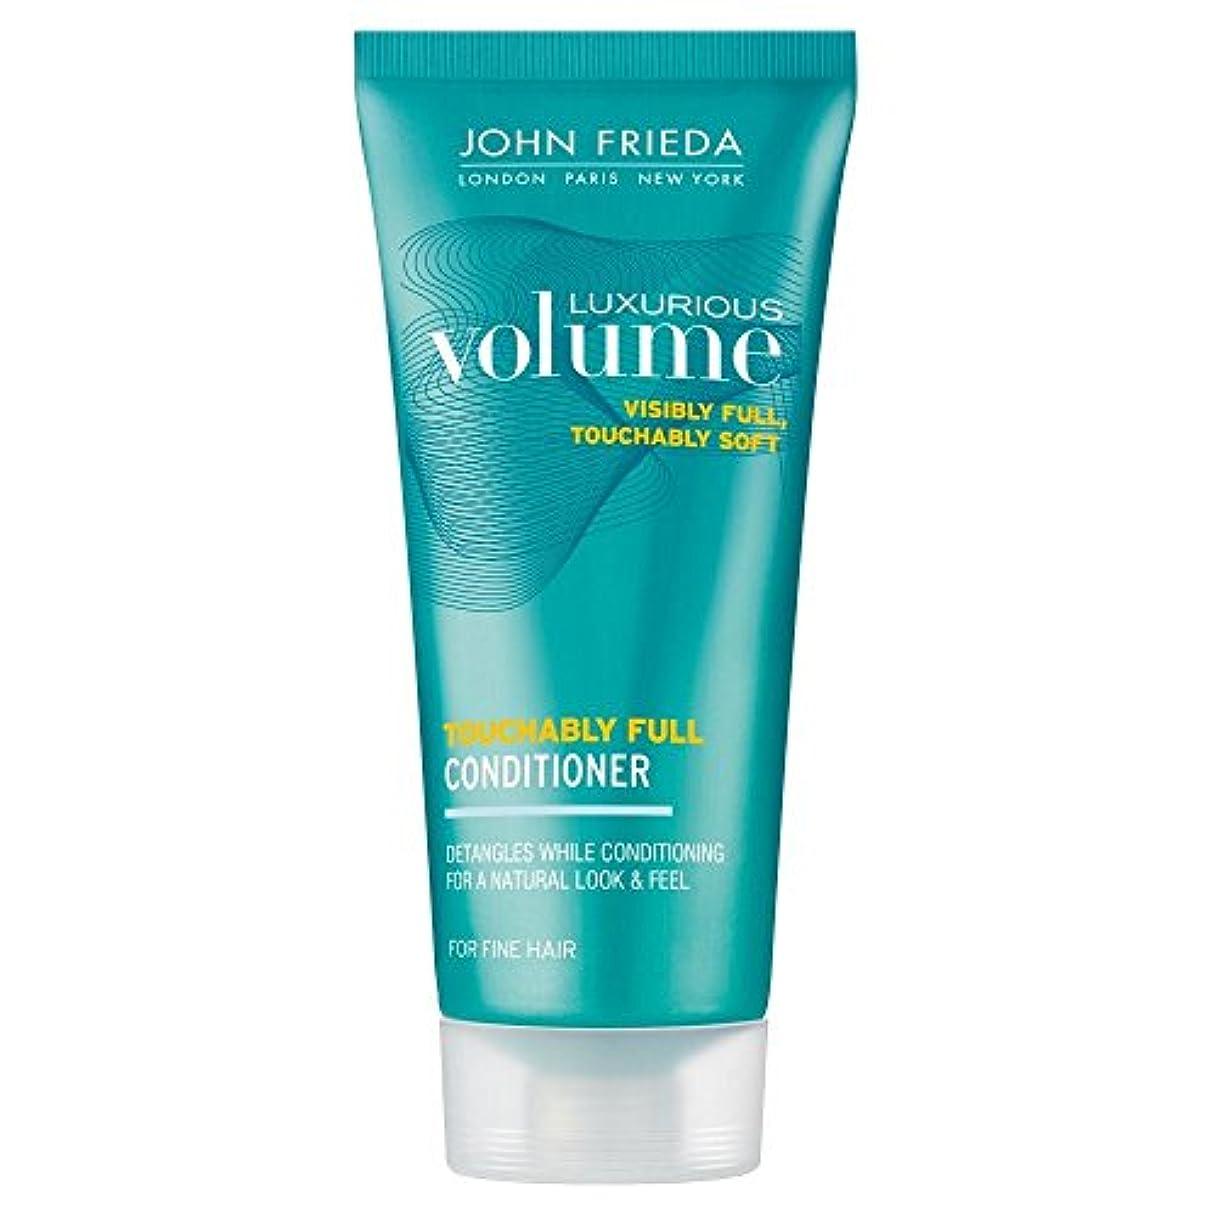 John Frieda Luxurious Volume Thickening Conditioner (50ml) ジョン?フリーダ豪華なボリューム増粘コンディショナー( 50ミリリットル) [並行輸入品]